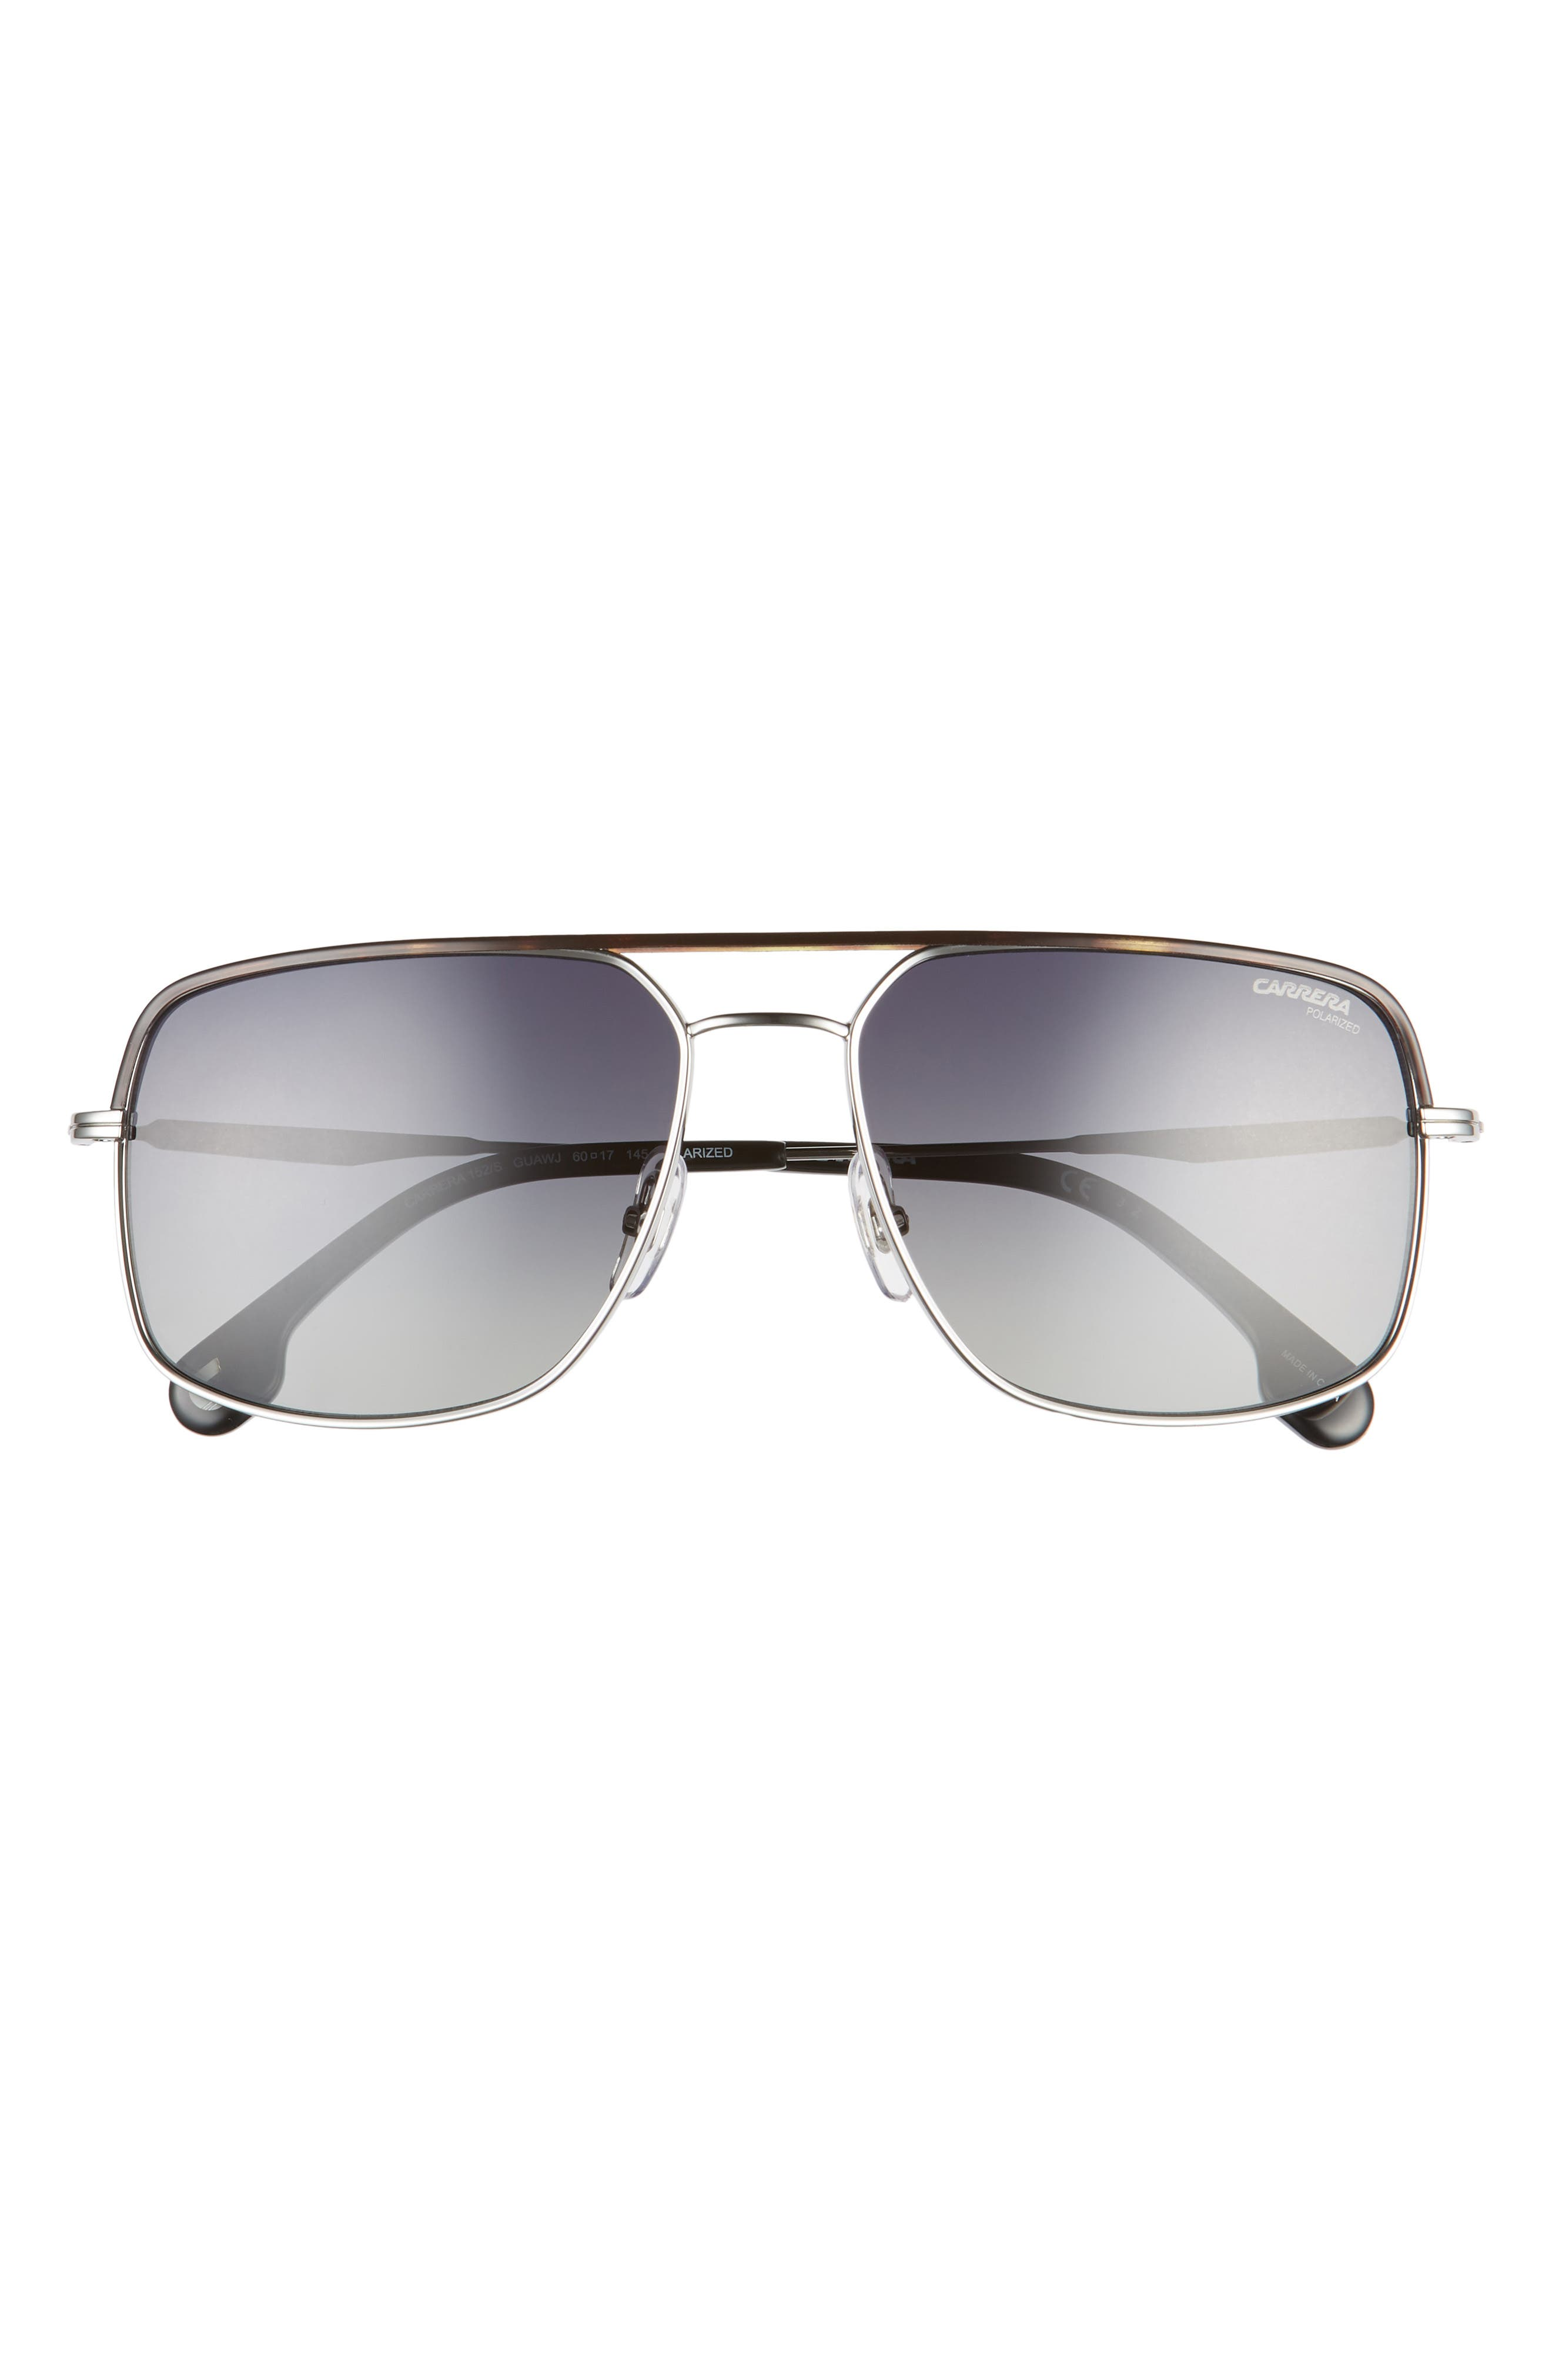 60mm Polarized Square Aviator Sunglasses